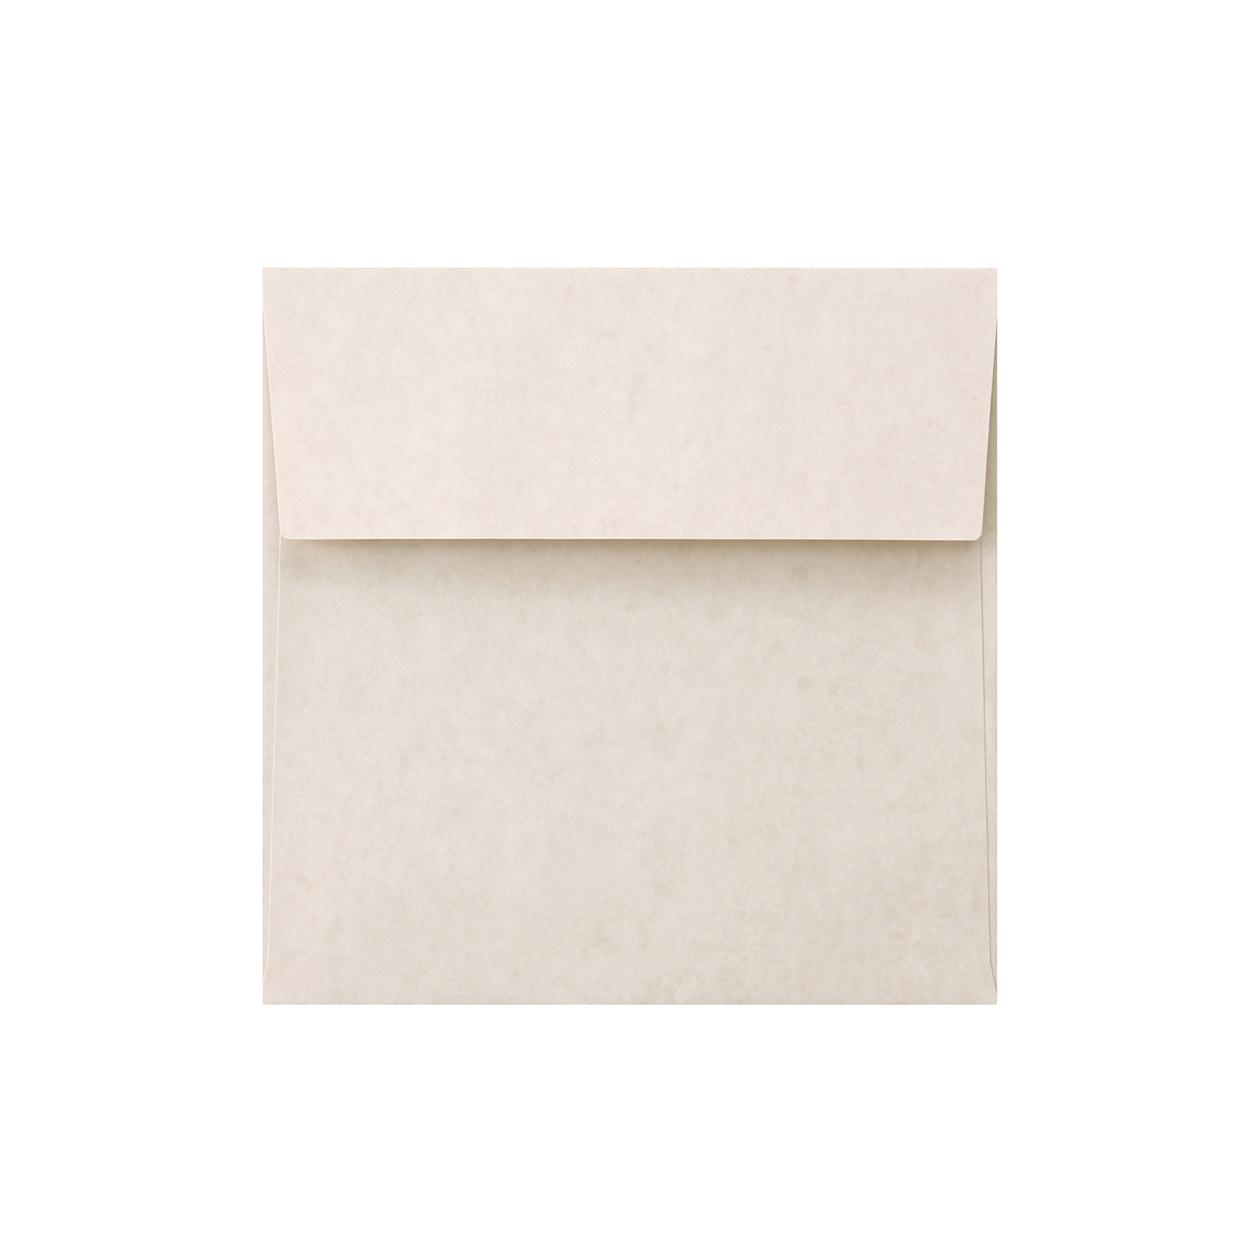 SE16カマス封筒 ホワイトクラフト 100g